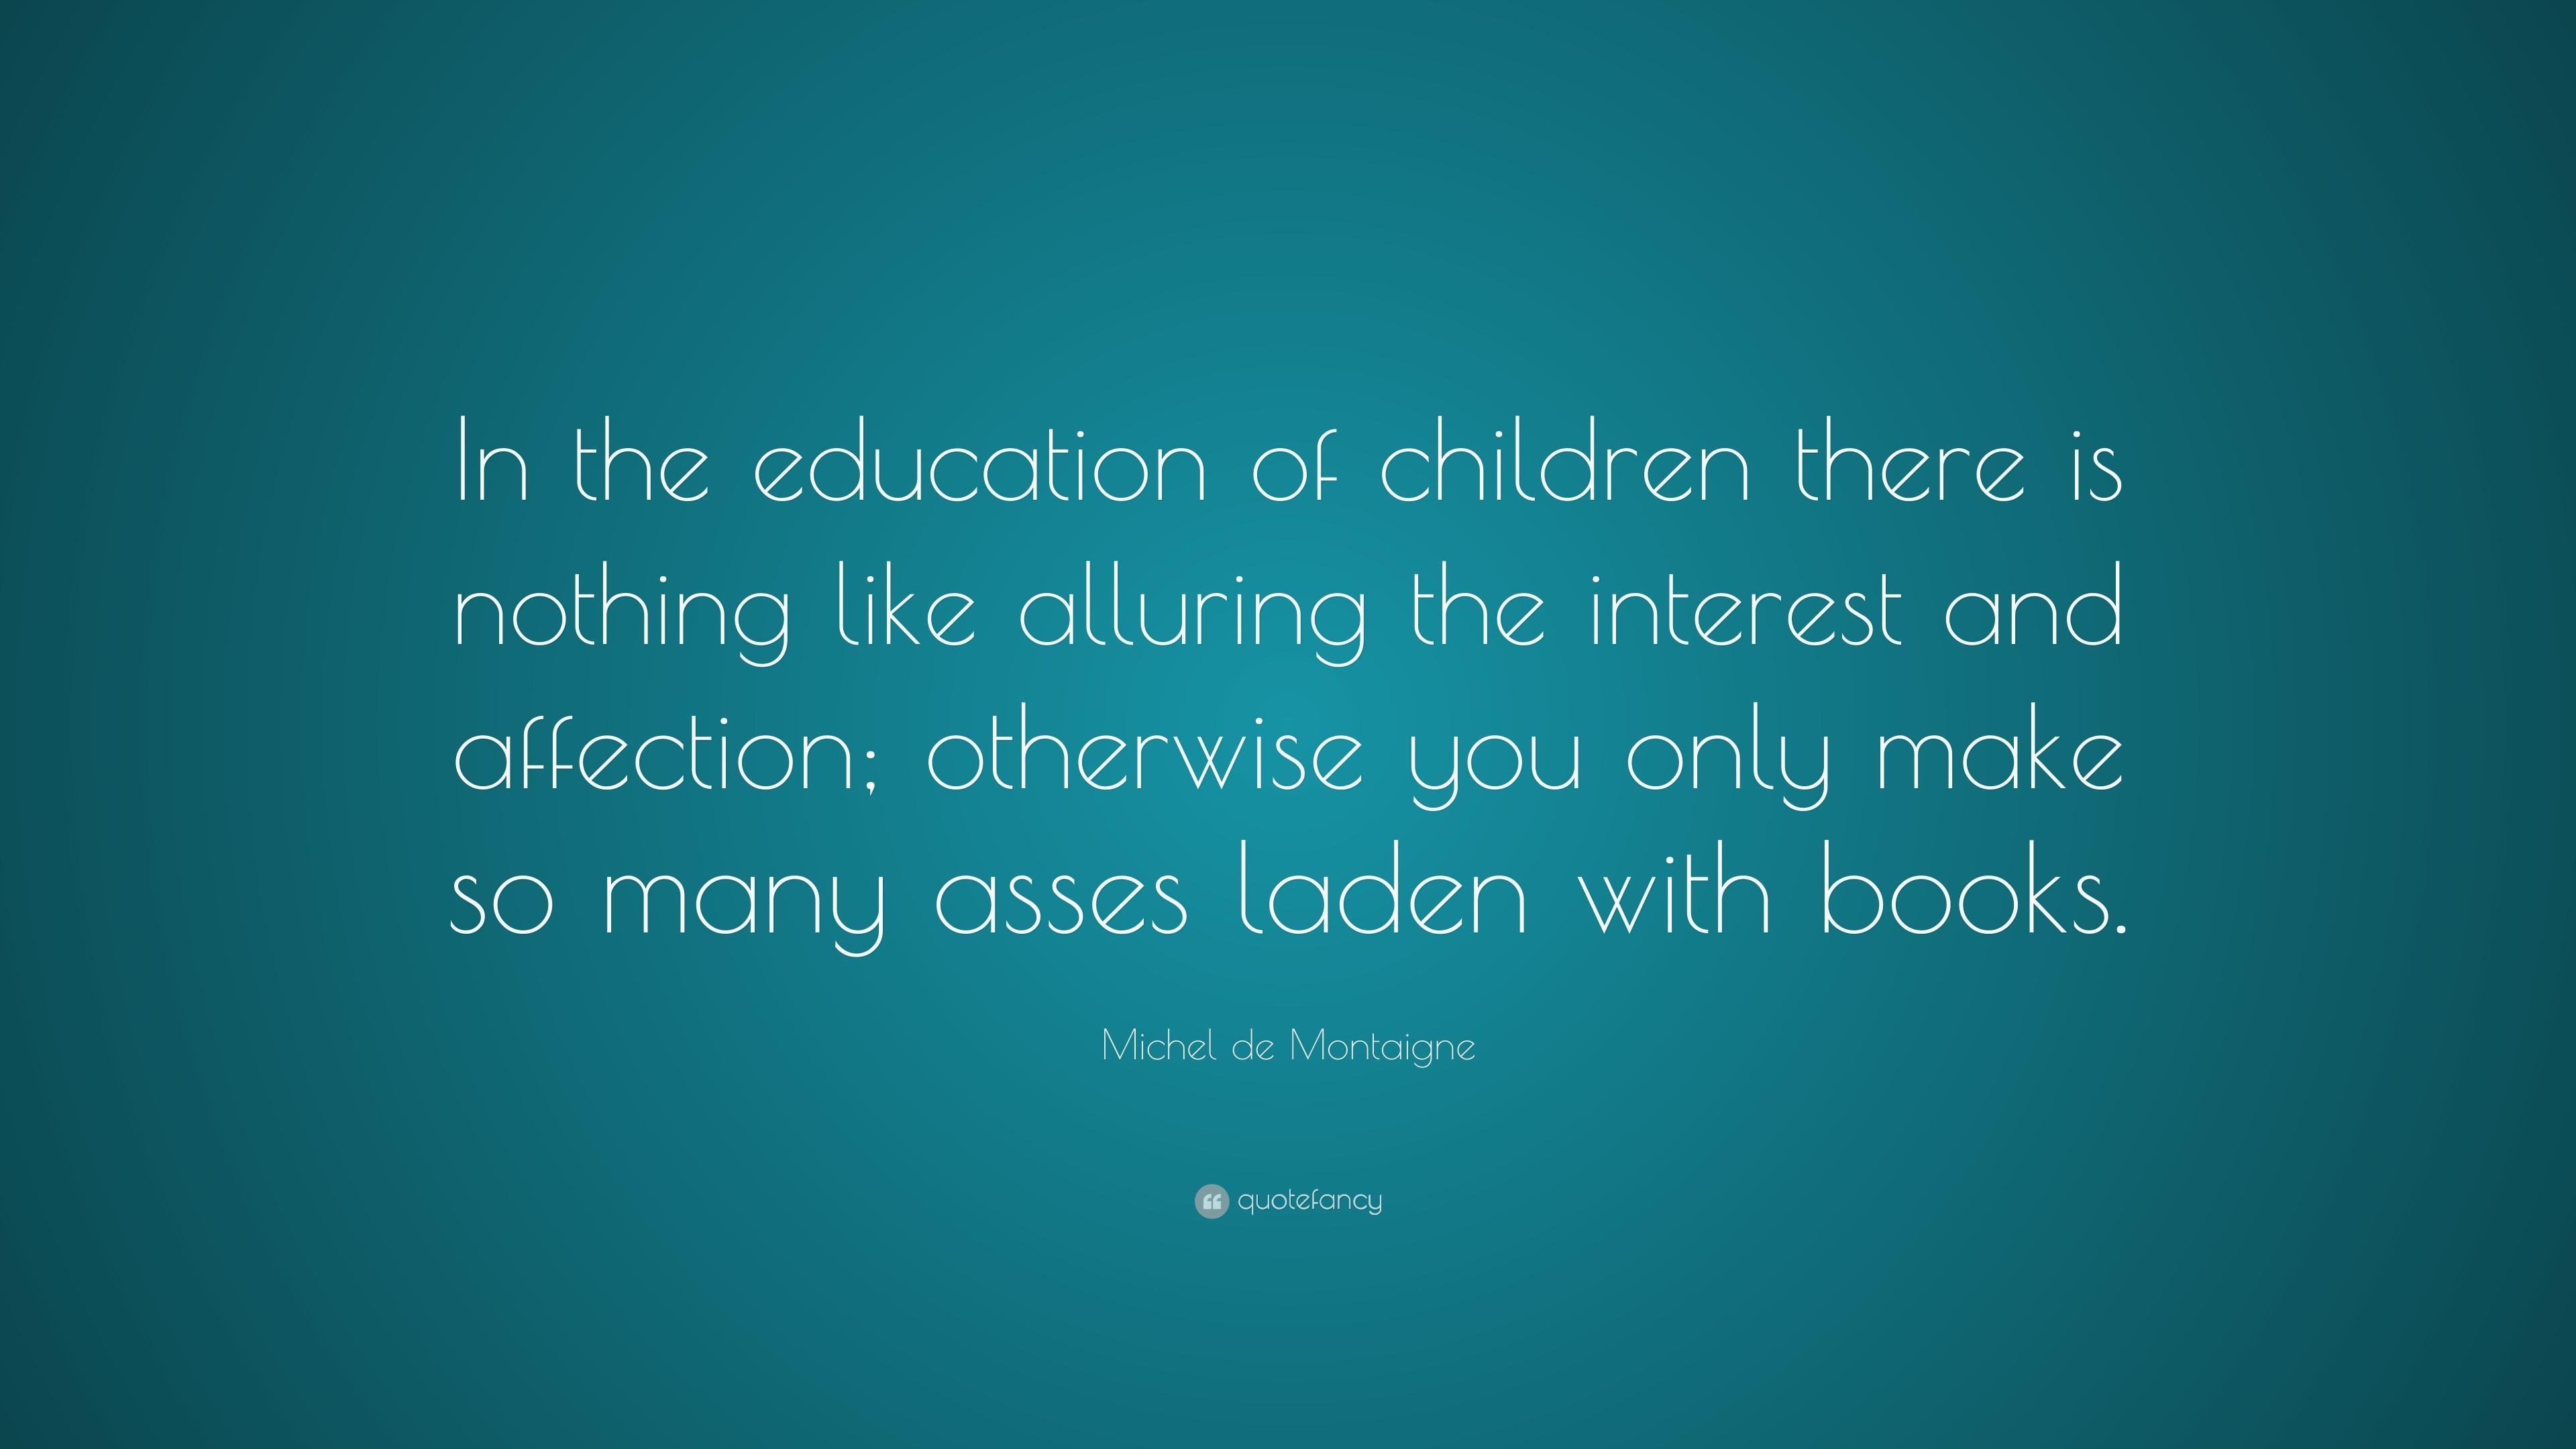 michel montaigne essay education children Montaigne' s essays, on the power of imagination, on the education of children of imagination as apparent from the title of this essay on the education of children.